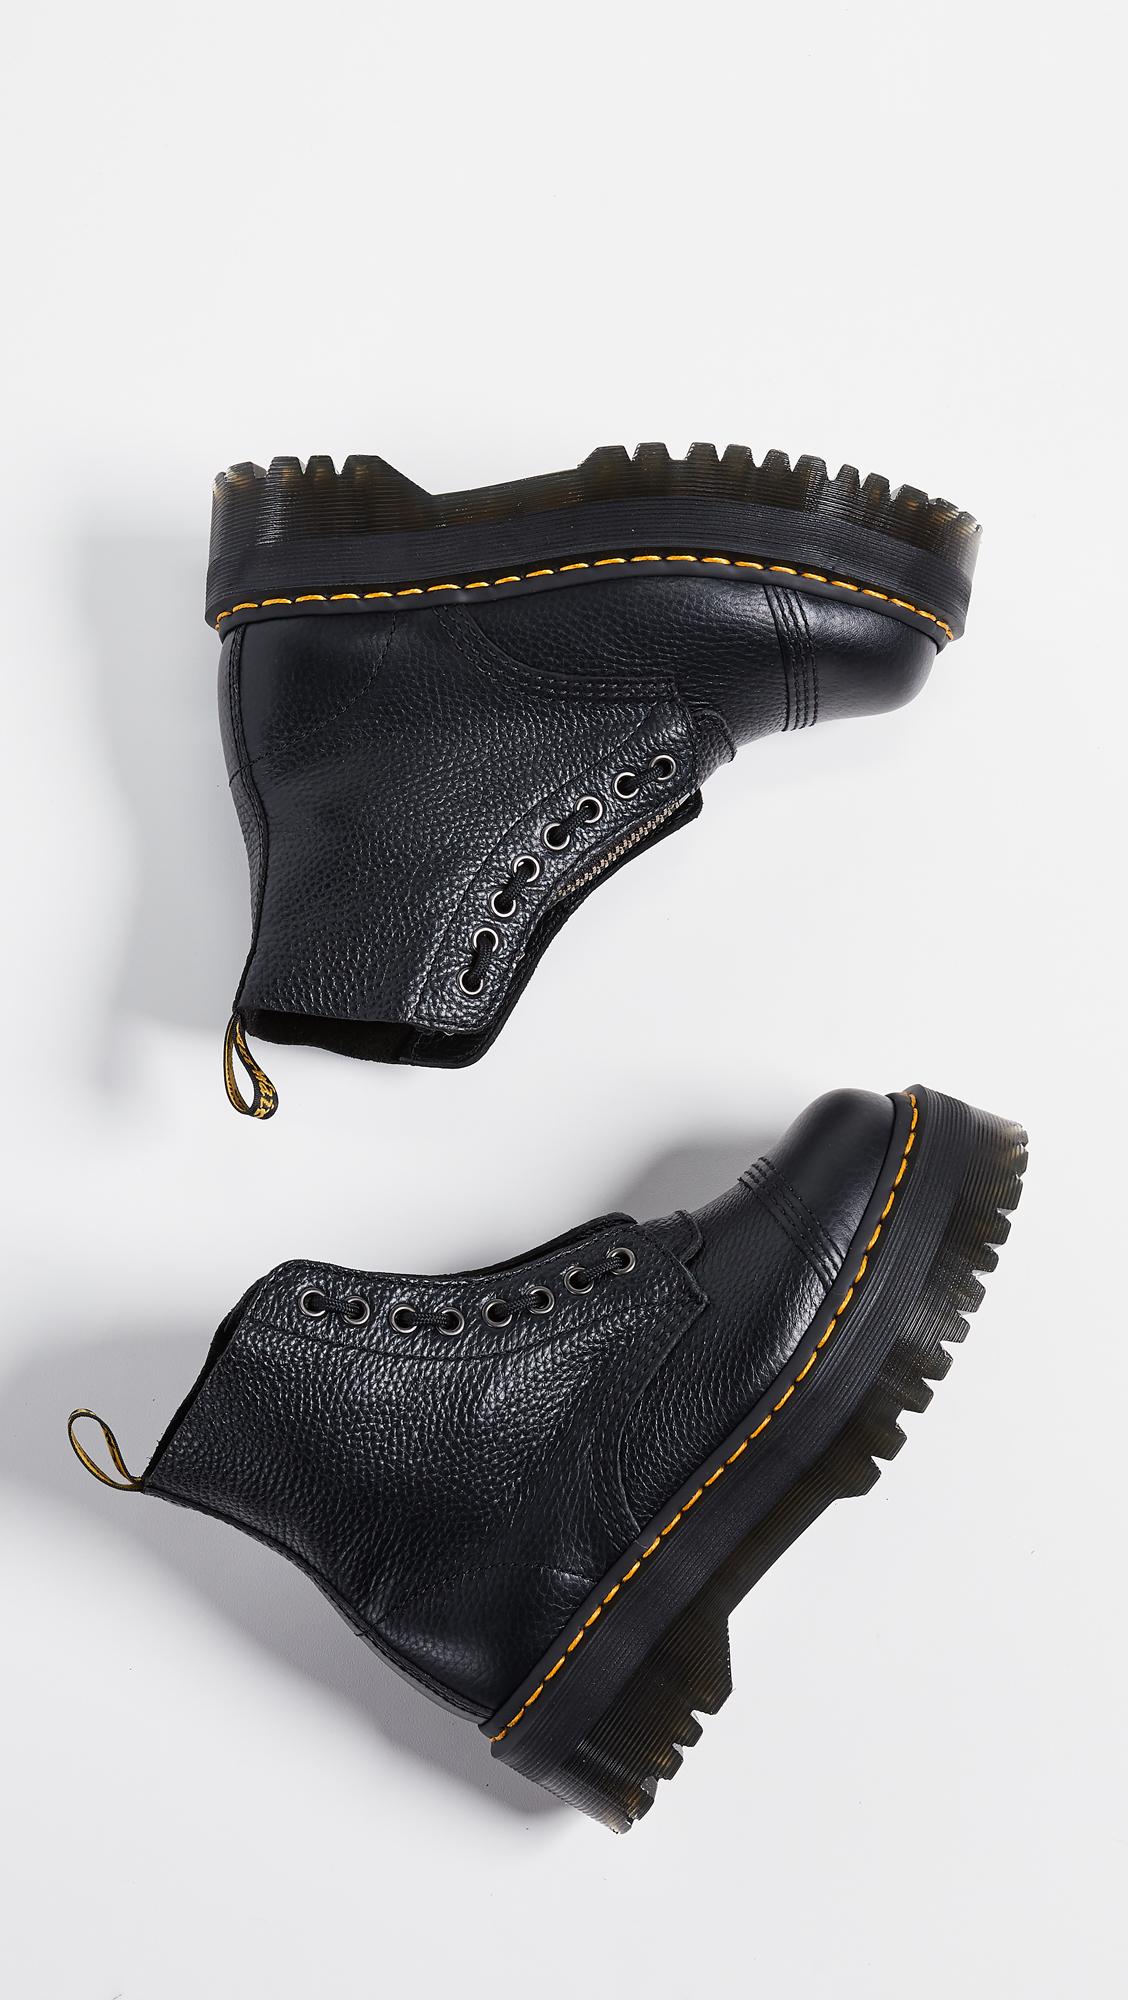 1a78b1105053 Dr. Martens Sinclair 8 Eye Boots